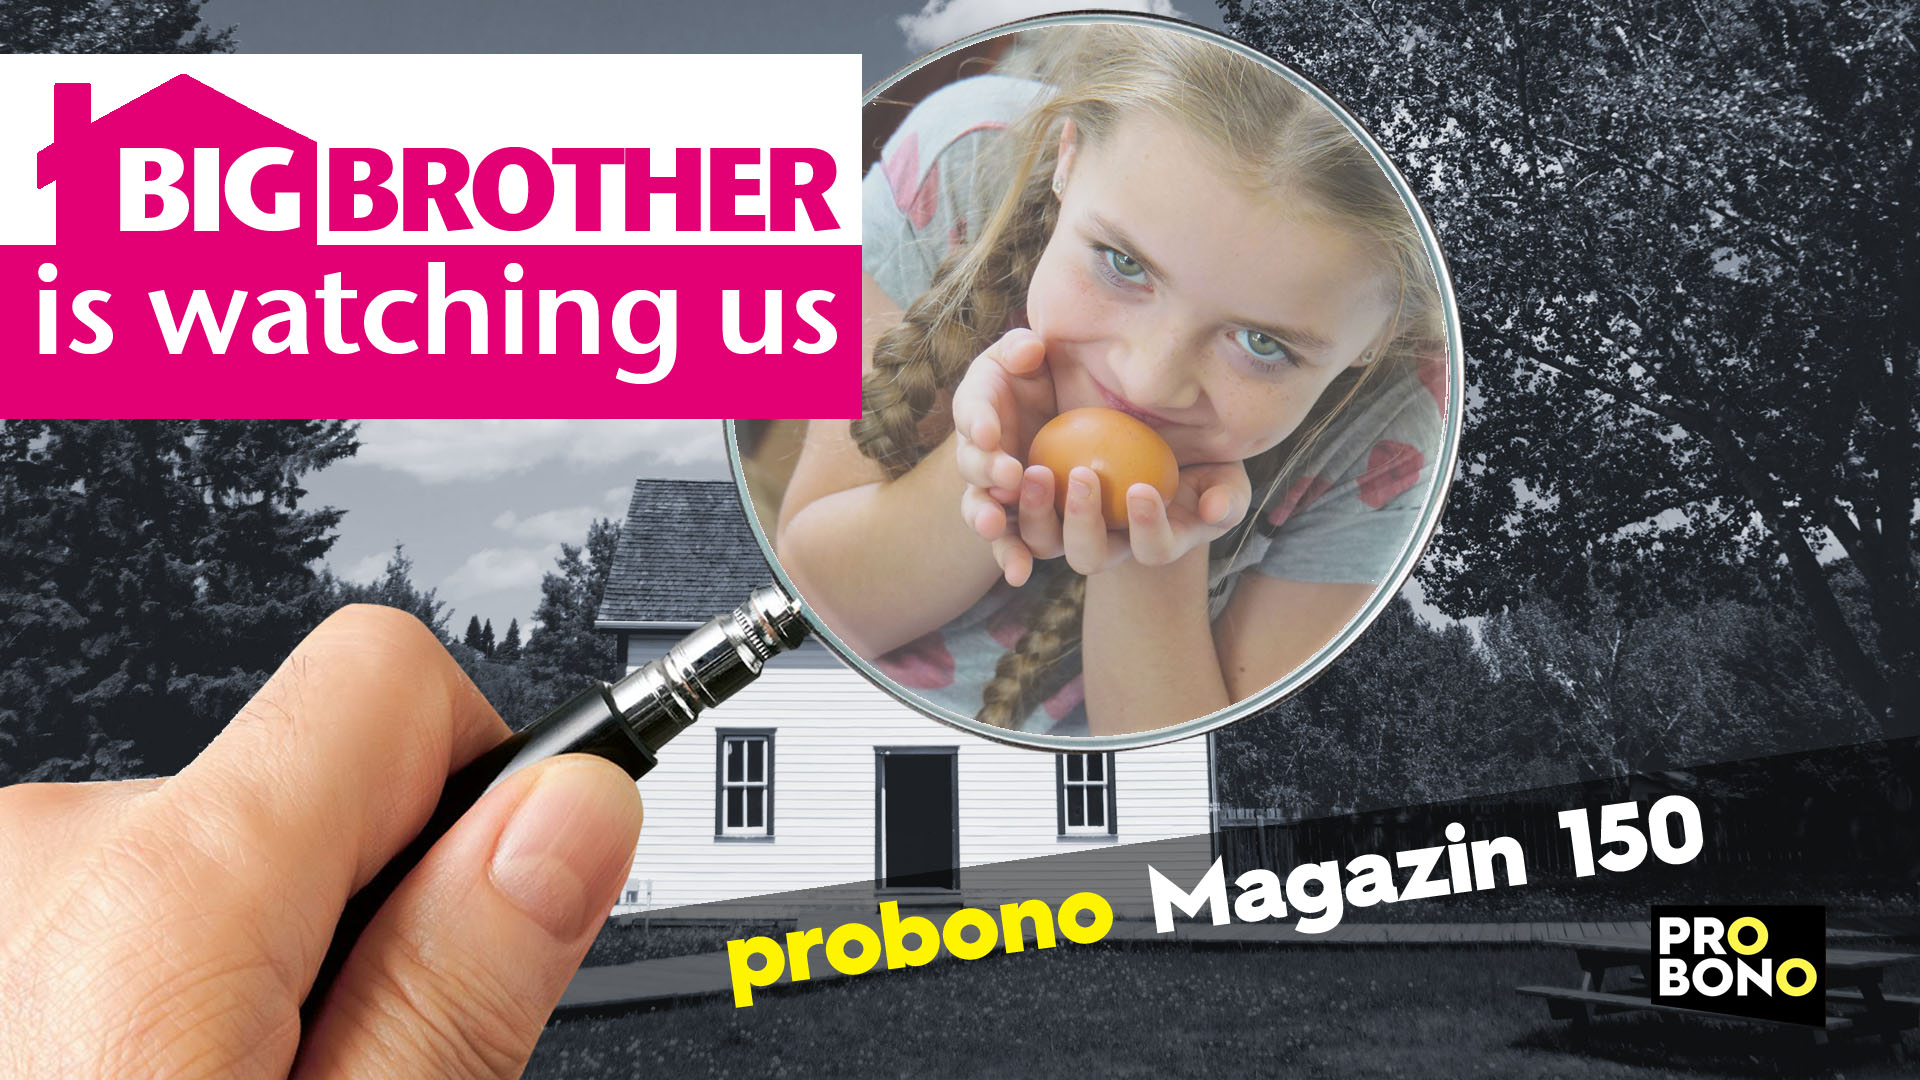 SmartHome mal anders: Überwachung zu Hause (probono Magazin)